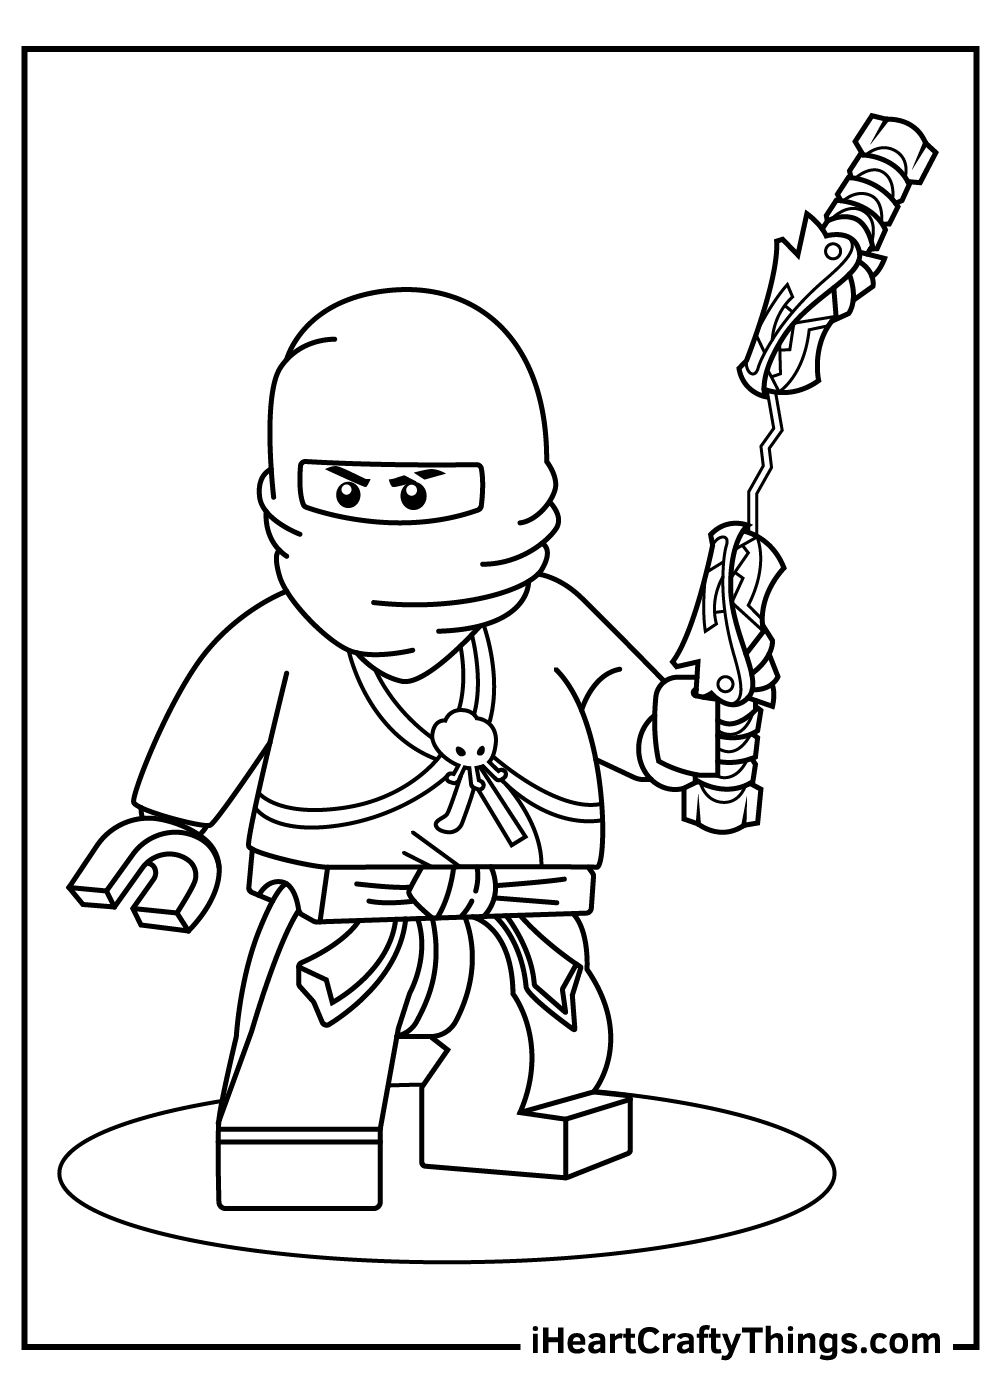 lego ninjago coloring pages to print